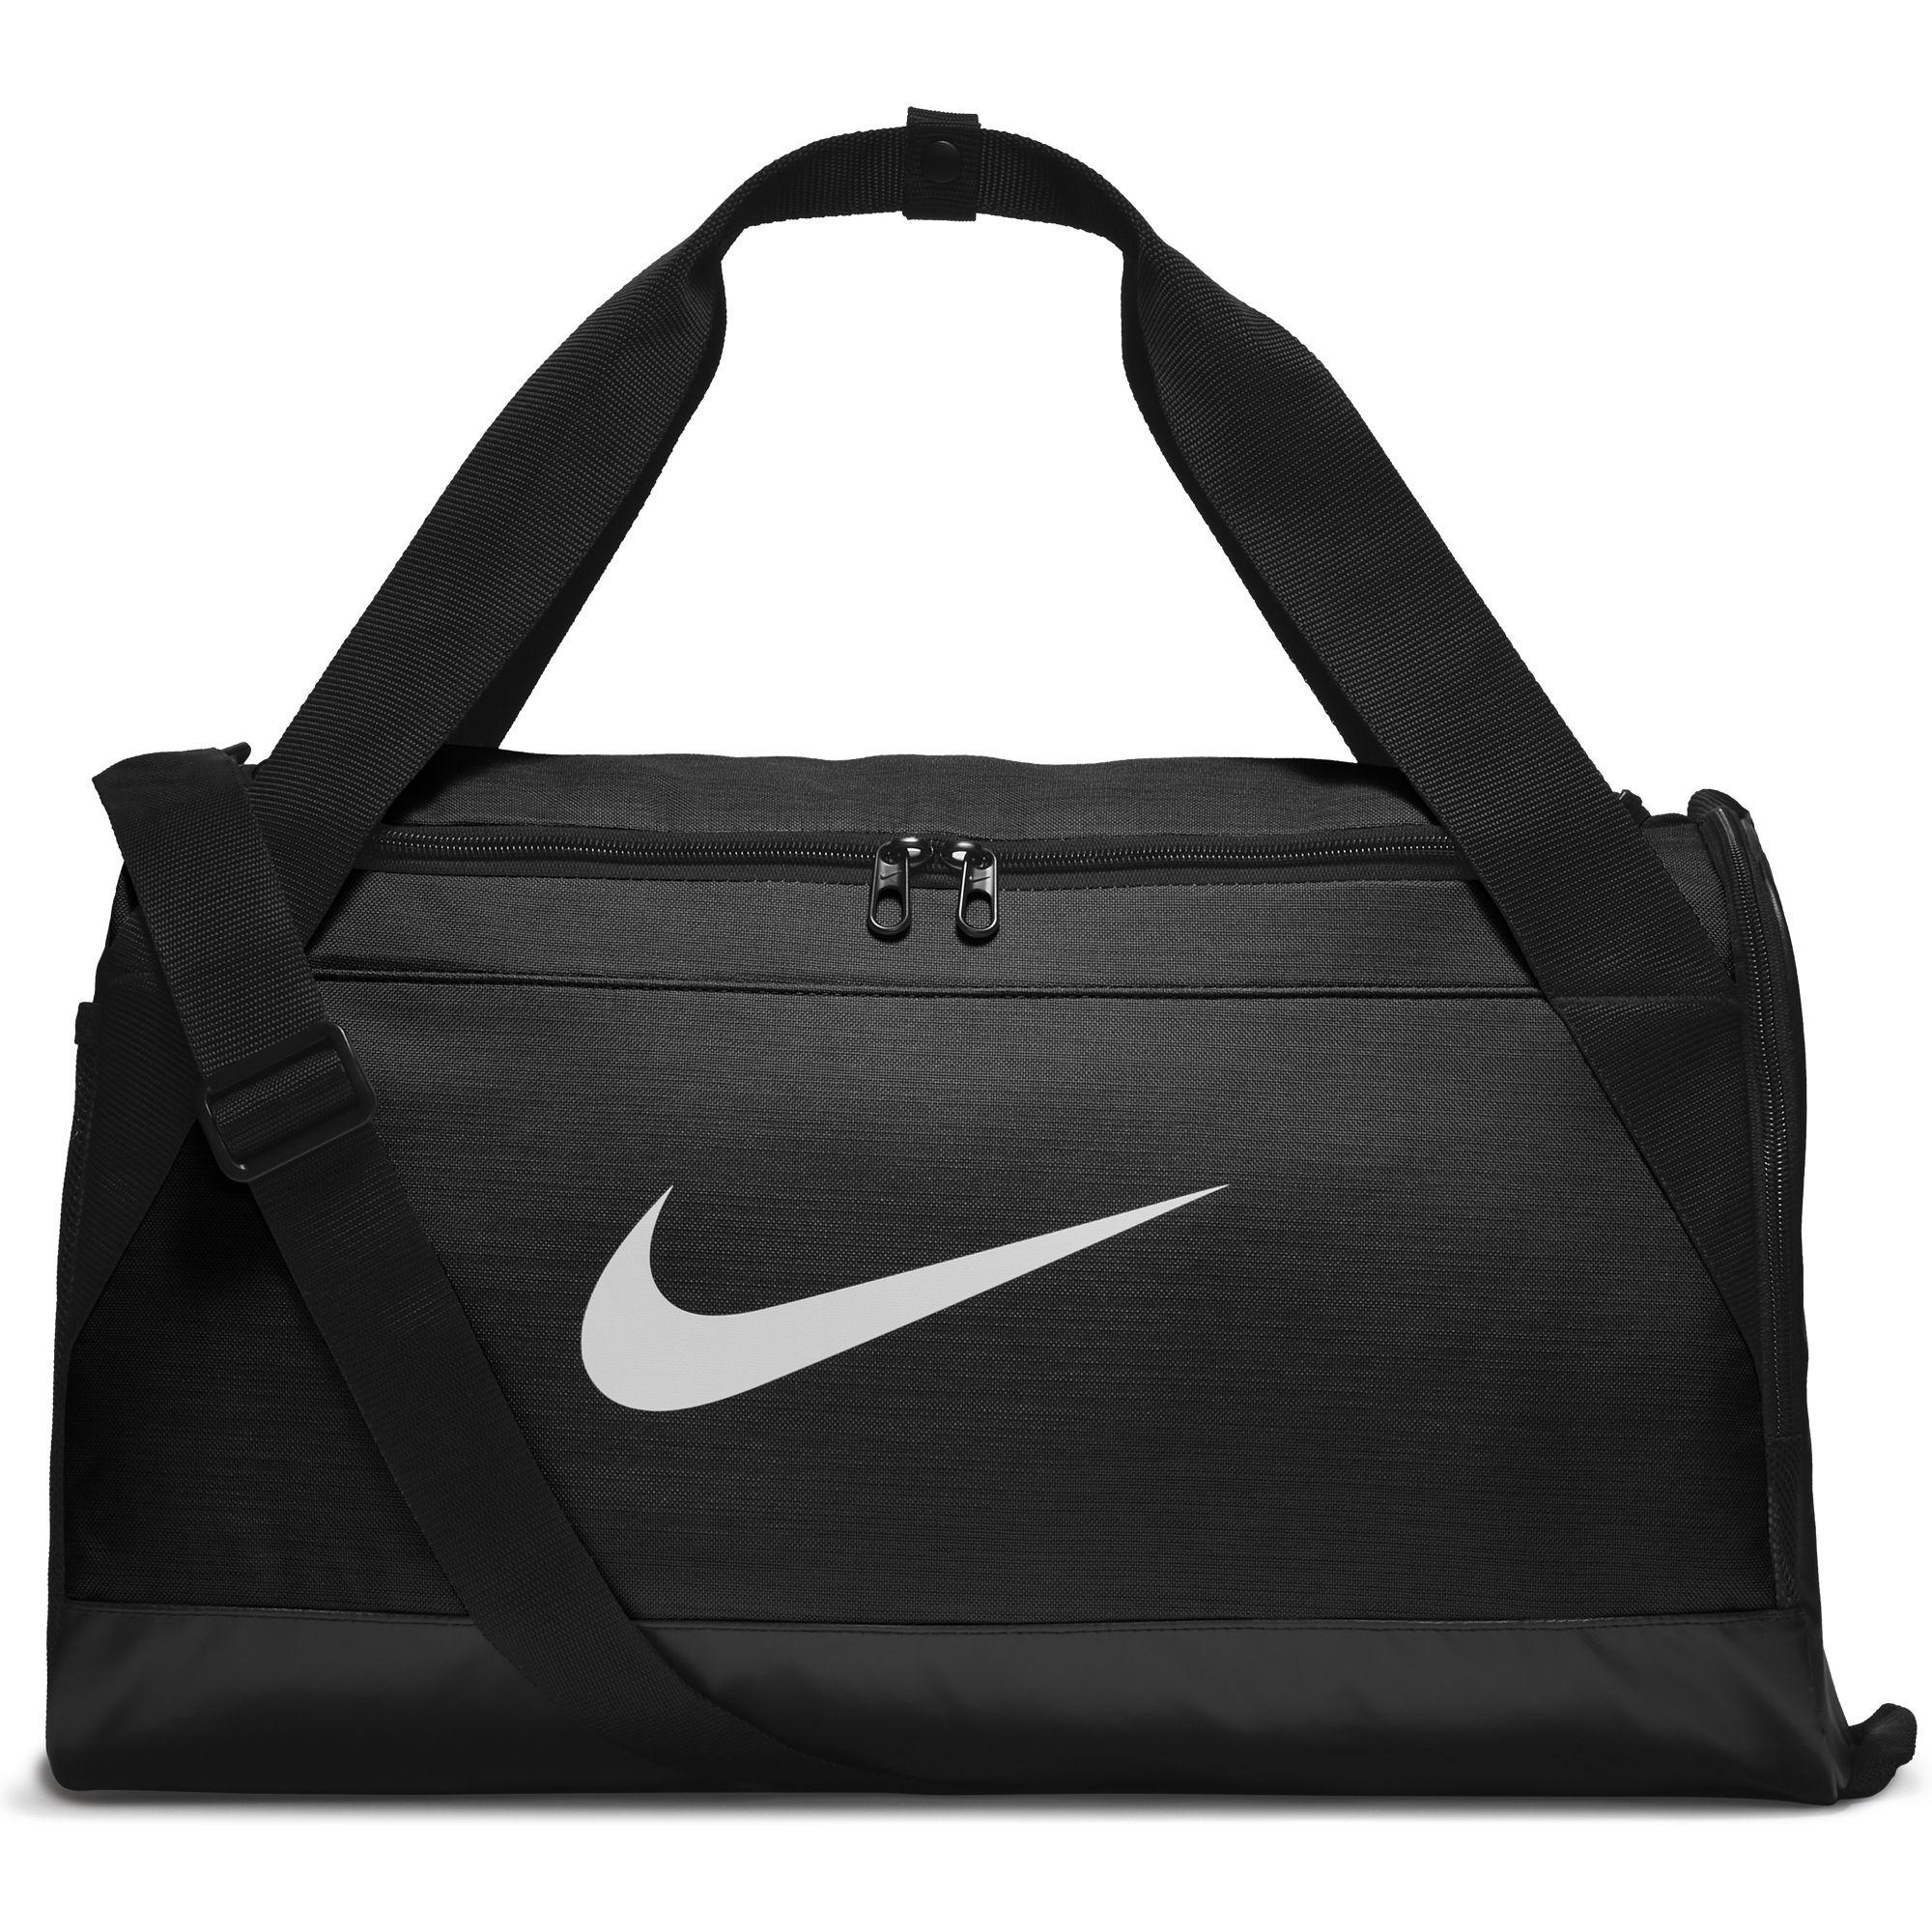 Nike Vapor Max Air Training Duffel Bag - Small - Bags ... |Nike Dry Bag